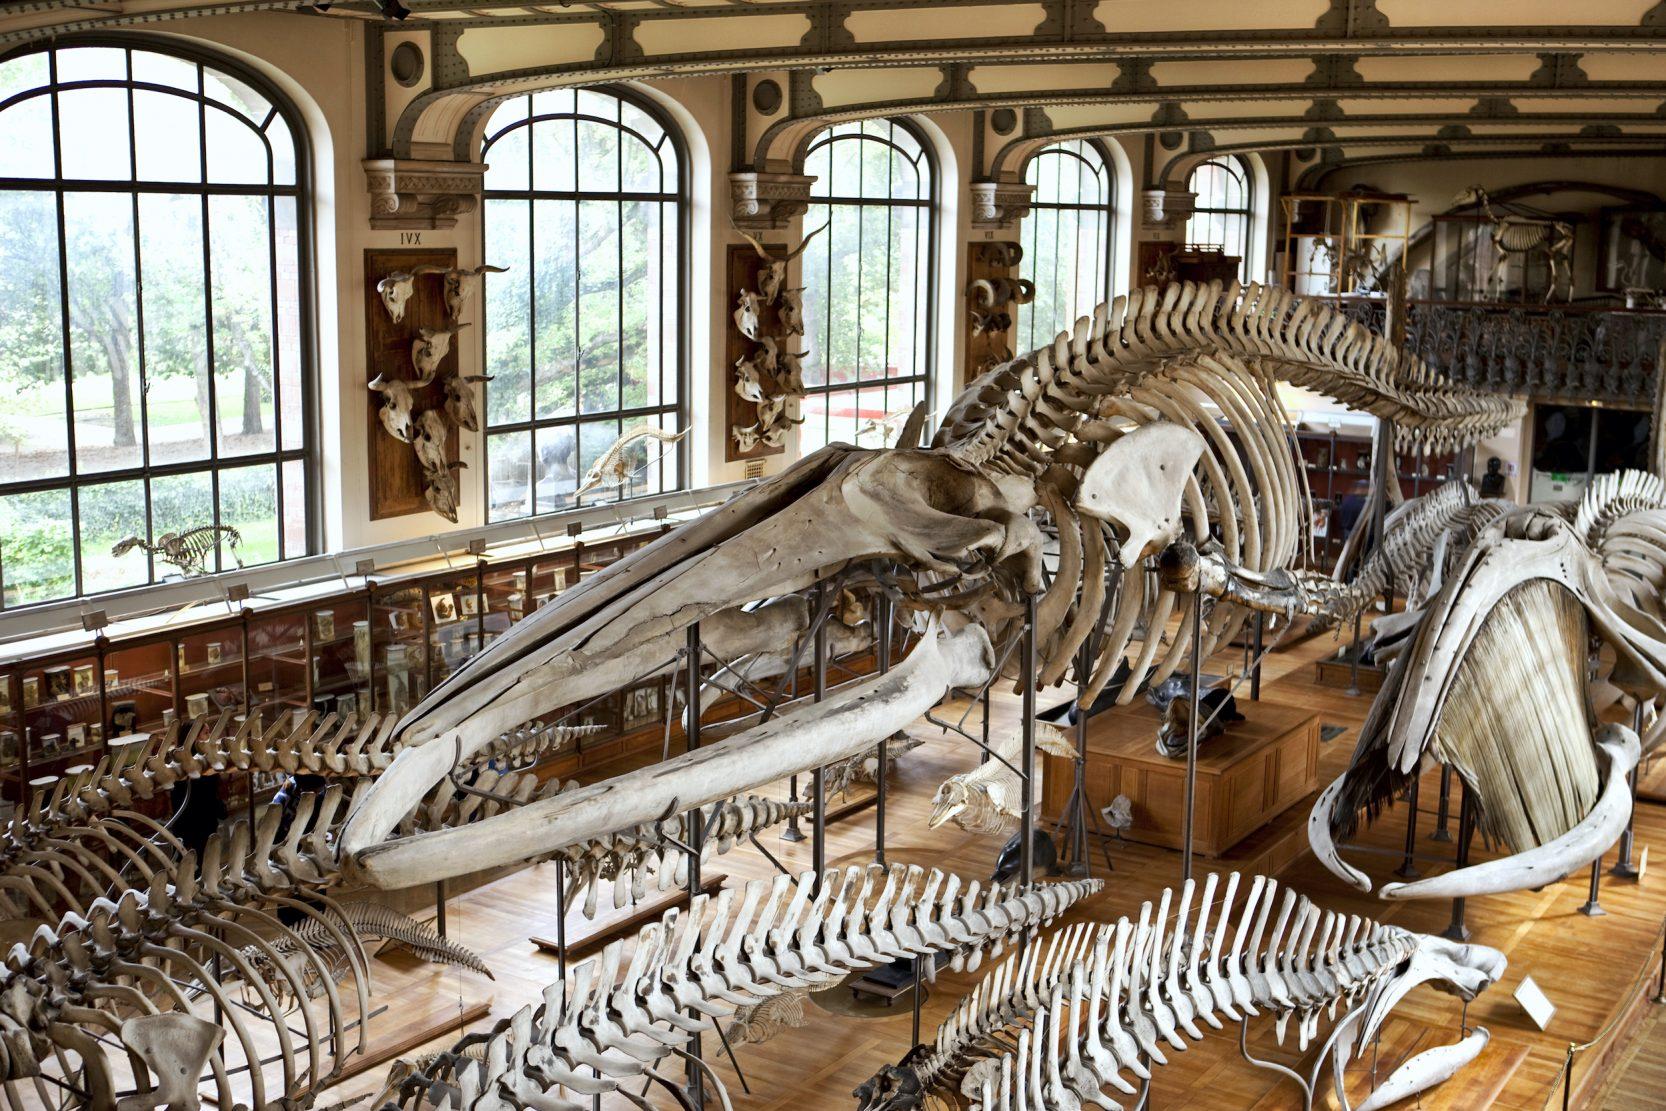 Dinosaur skeleton breaks record at auction